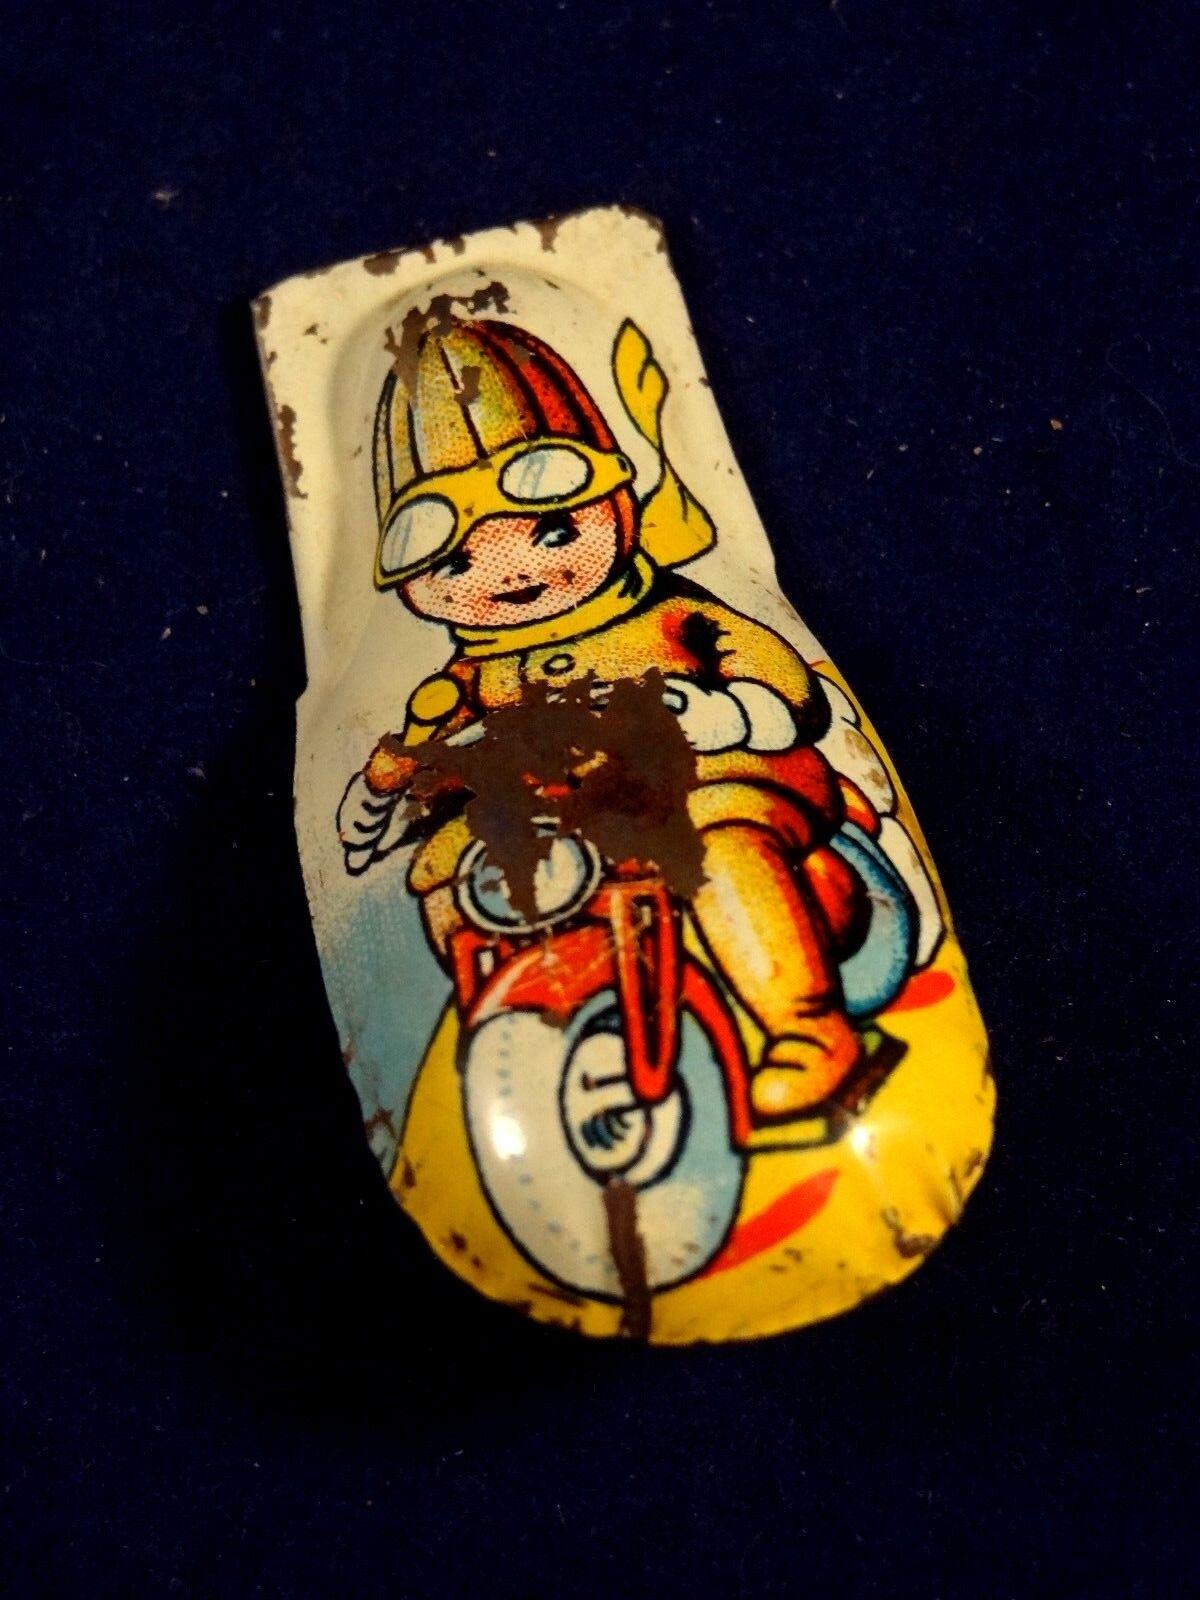 Ancien jouet clic-clac clicker tôle enfant motard moto us zone germany 1950